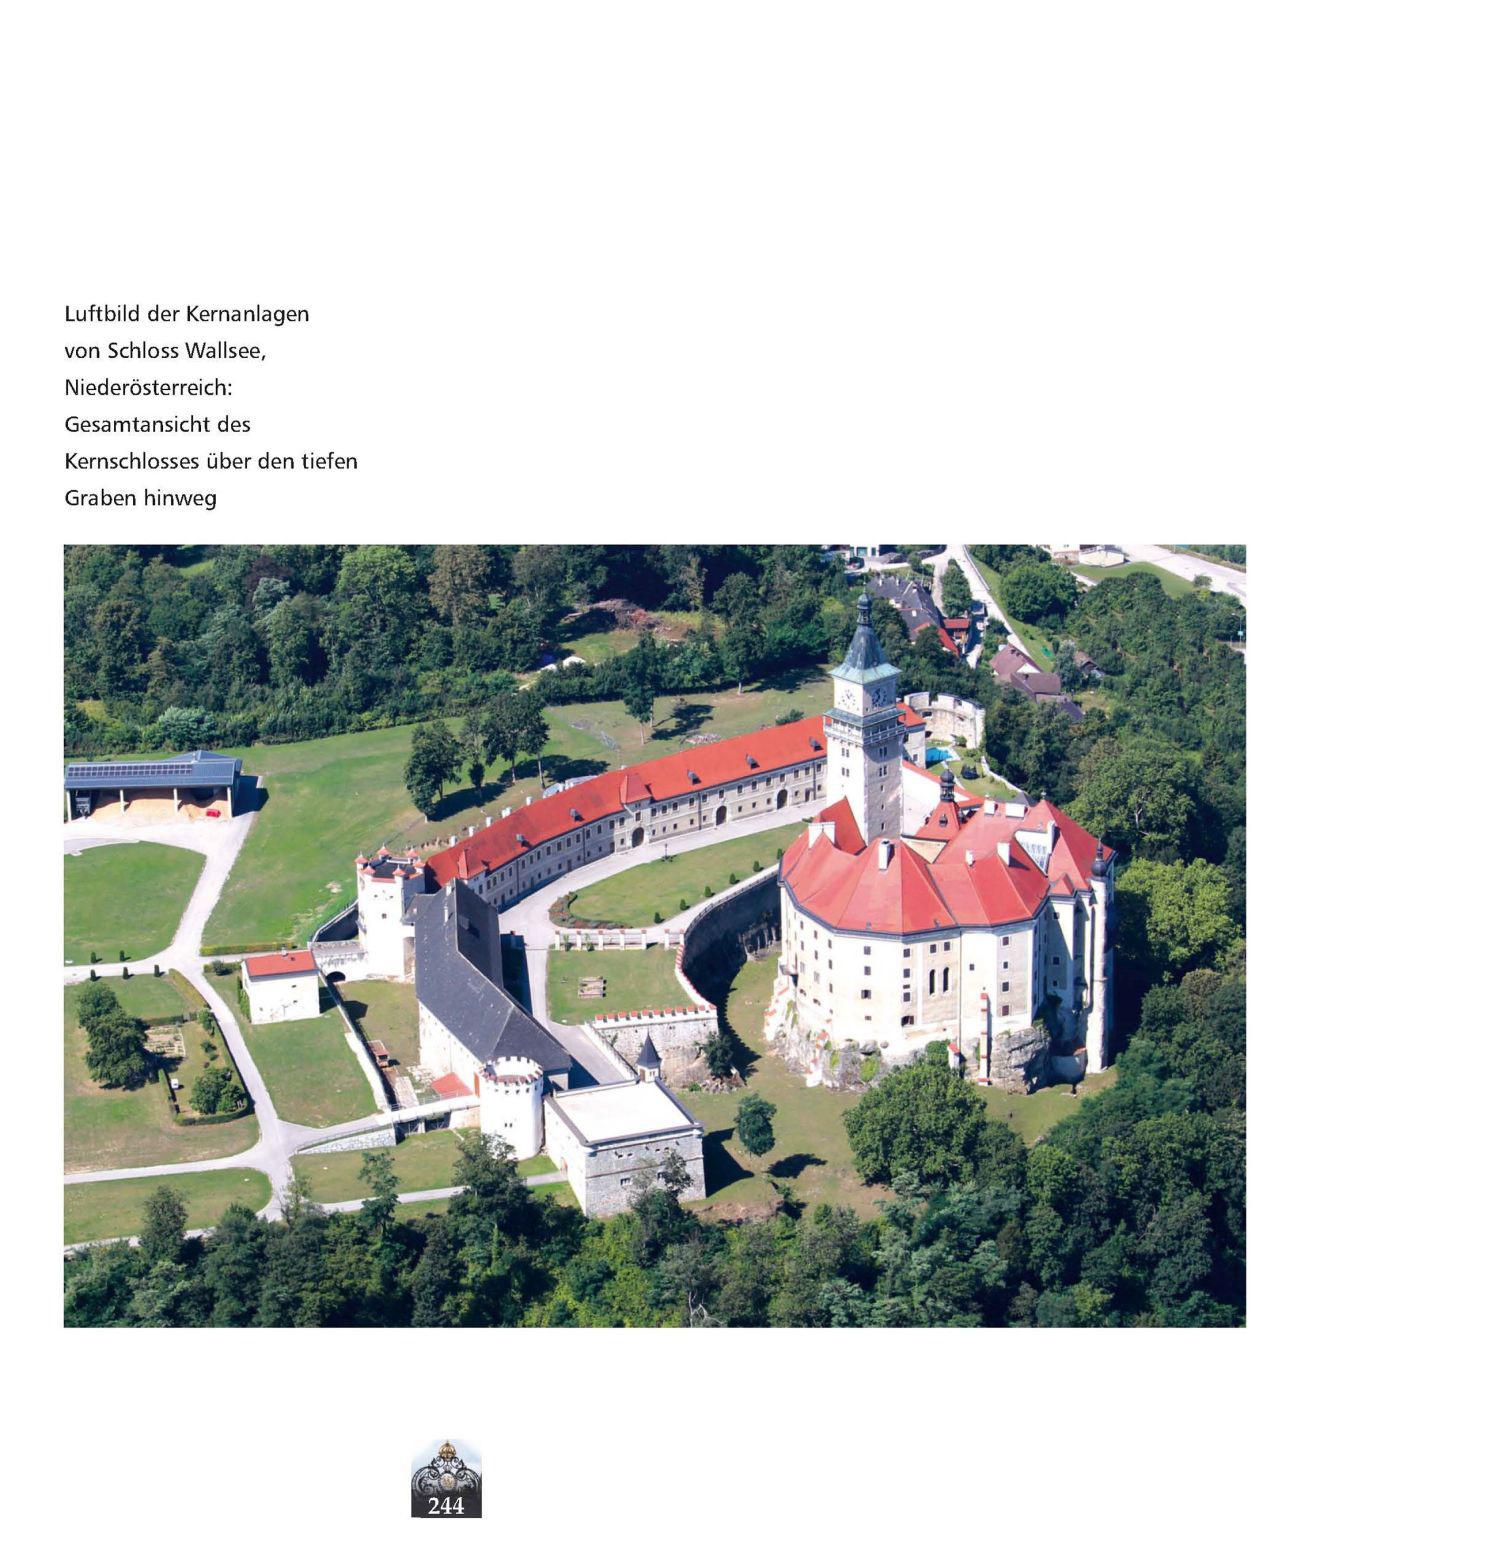 Schloss Wallsee, Luftbild © Stefanie Grüssl